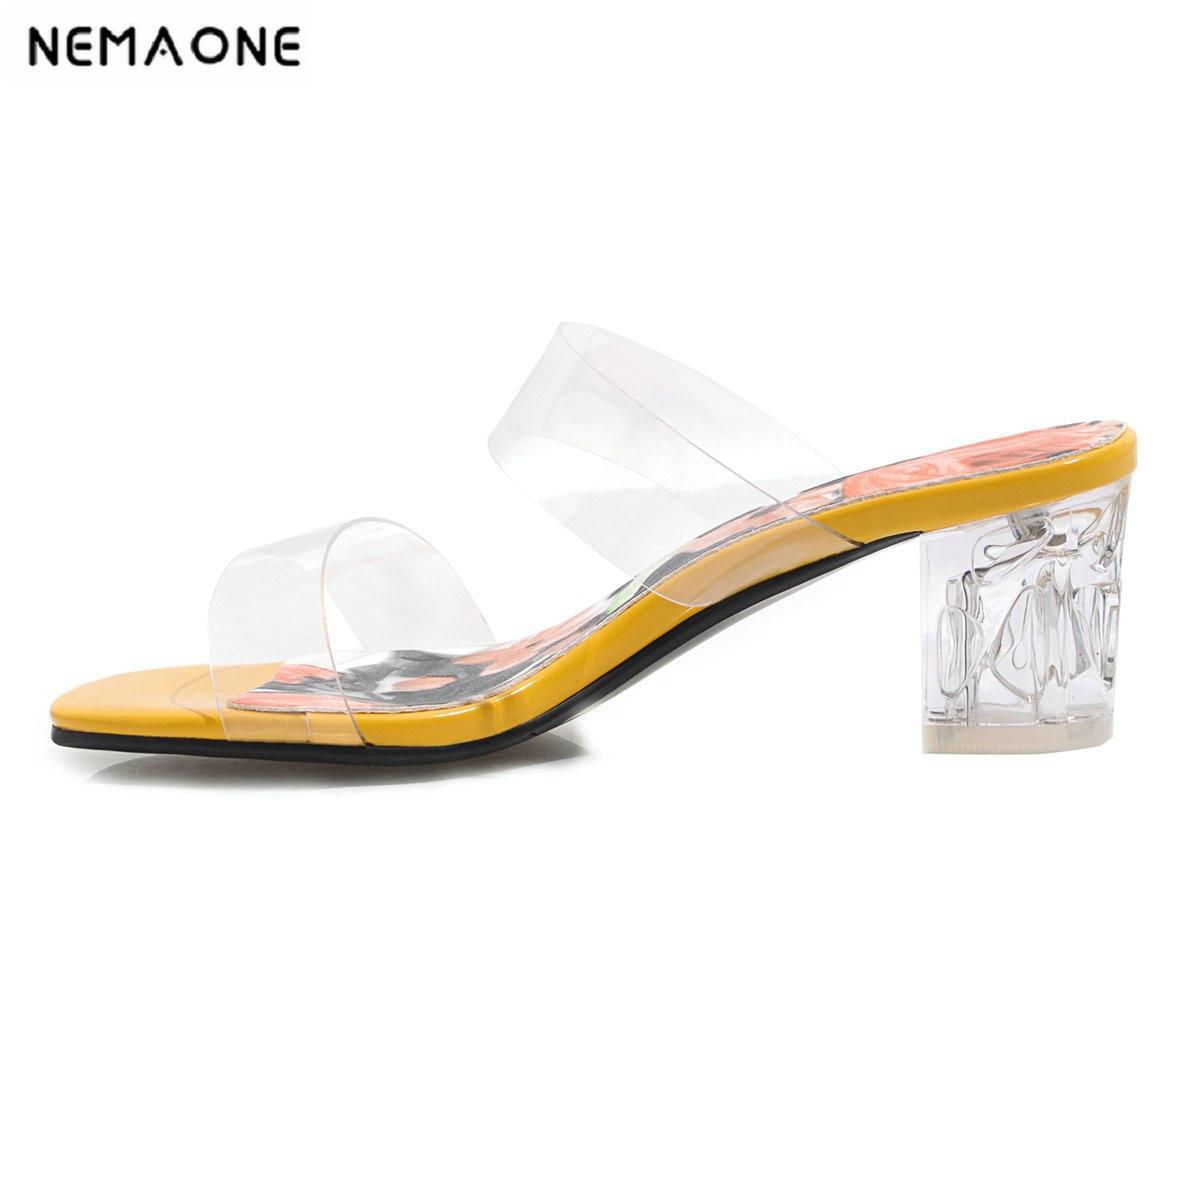 NEMAONE PVC Jelly Slippers Sandals Open Toe Square heel Women Transparent high heels women Slippers Shoes woman